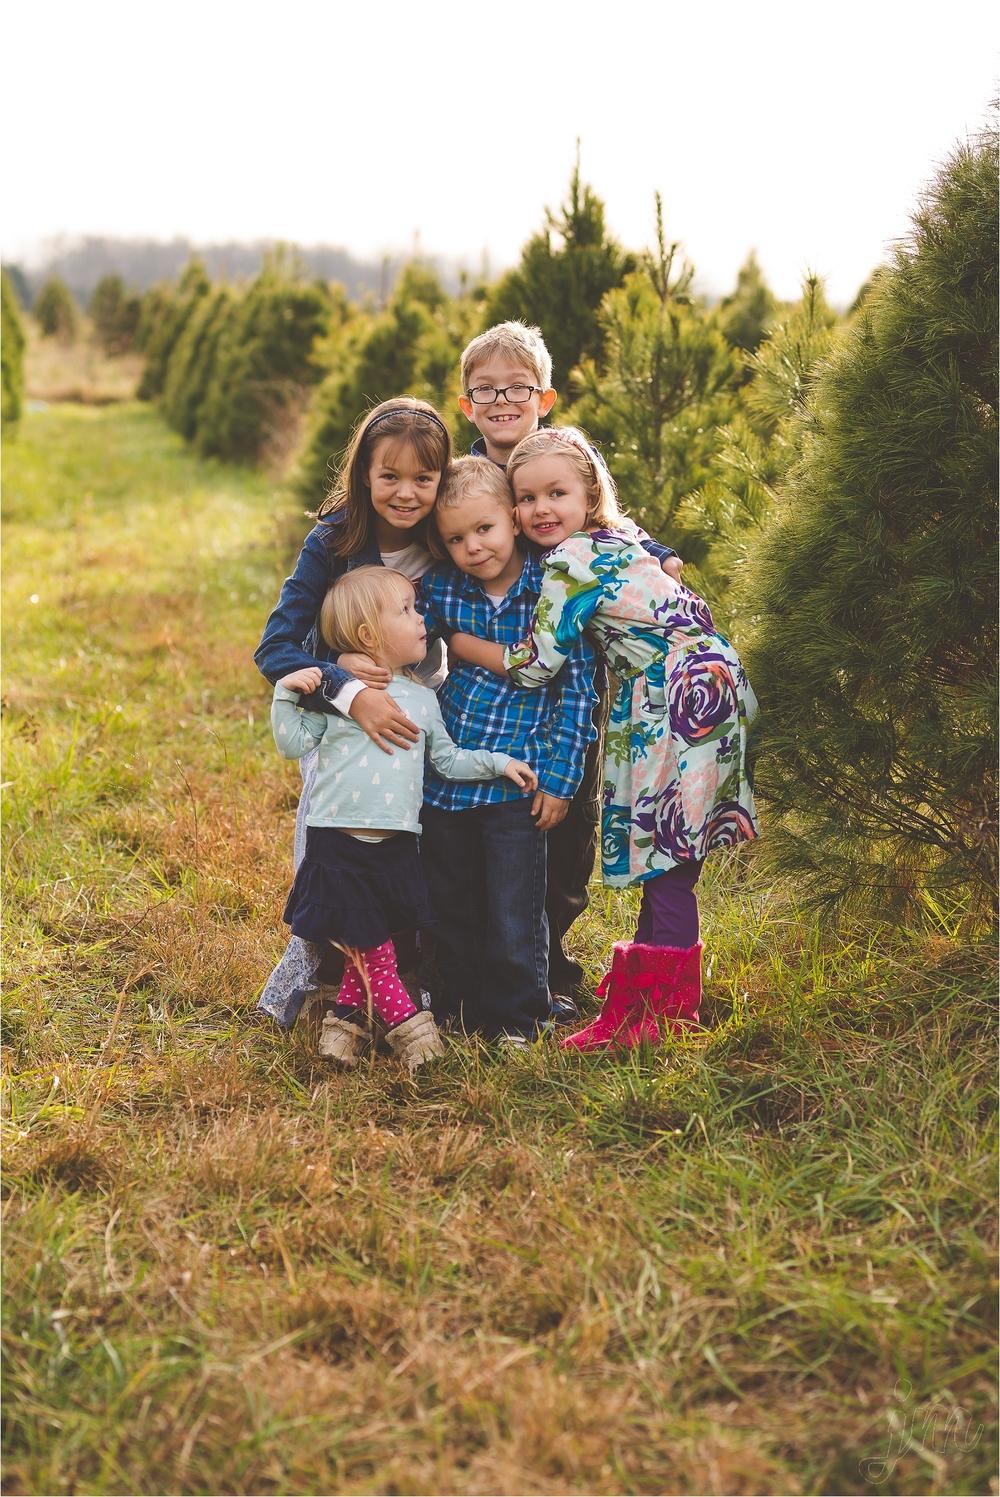 christmas-tree-farm-session-pnw-jannicka-mayte_0007.jpg